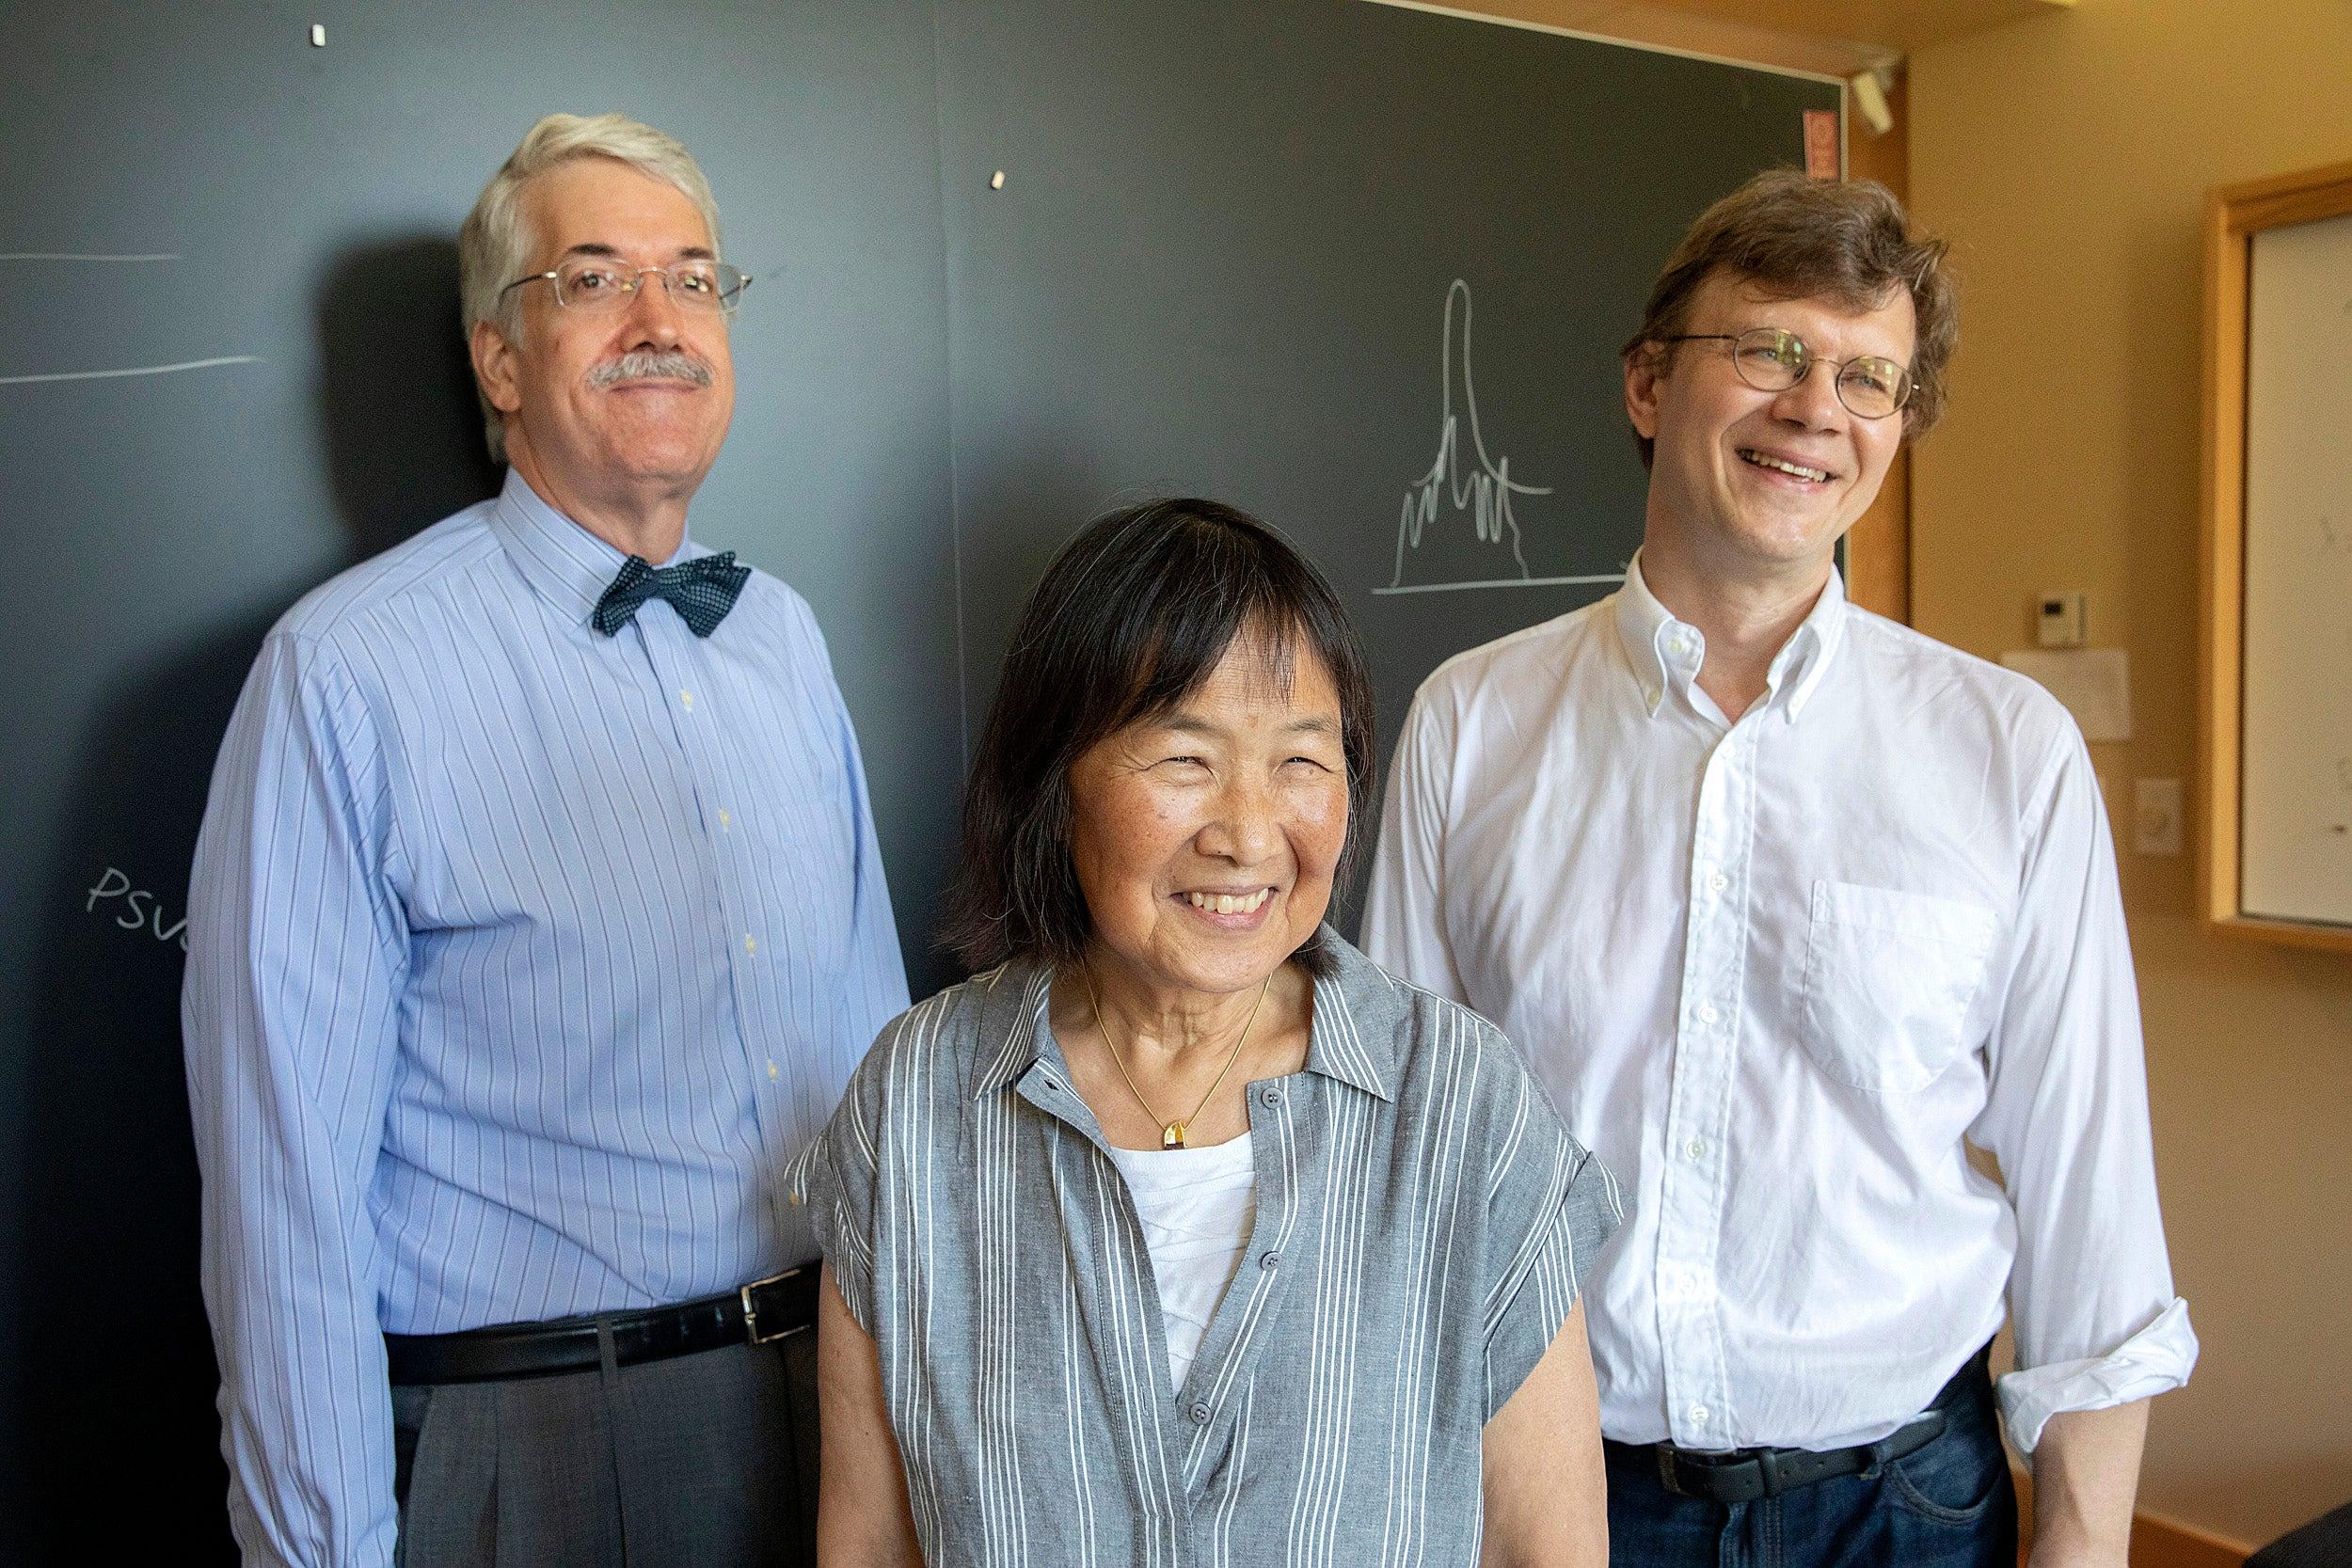 John Doyle, Evelyn Hu, and Mikhail Lukin.